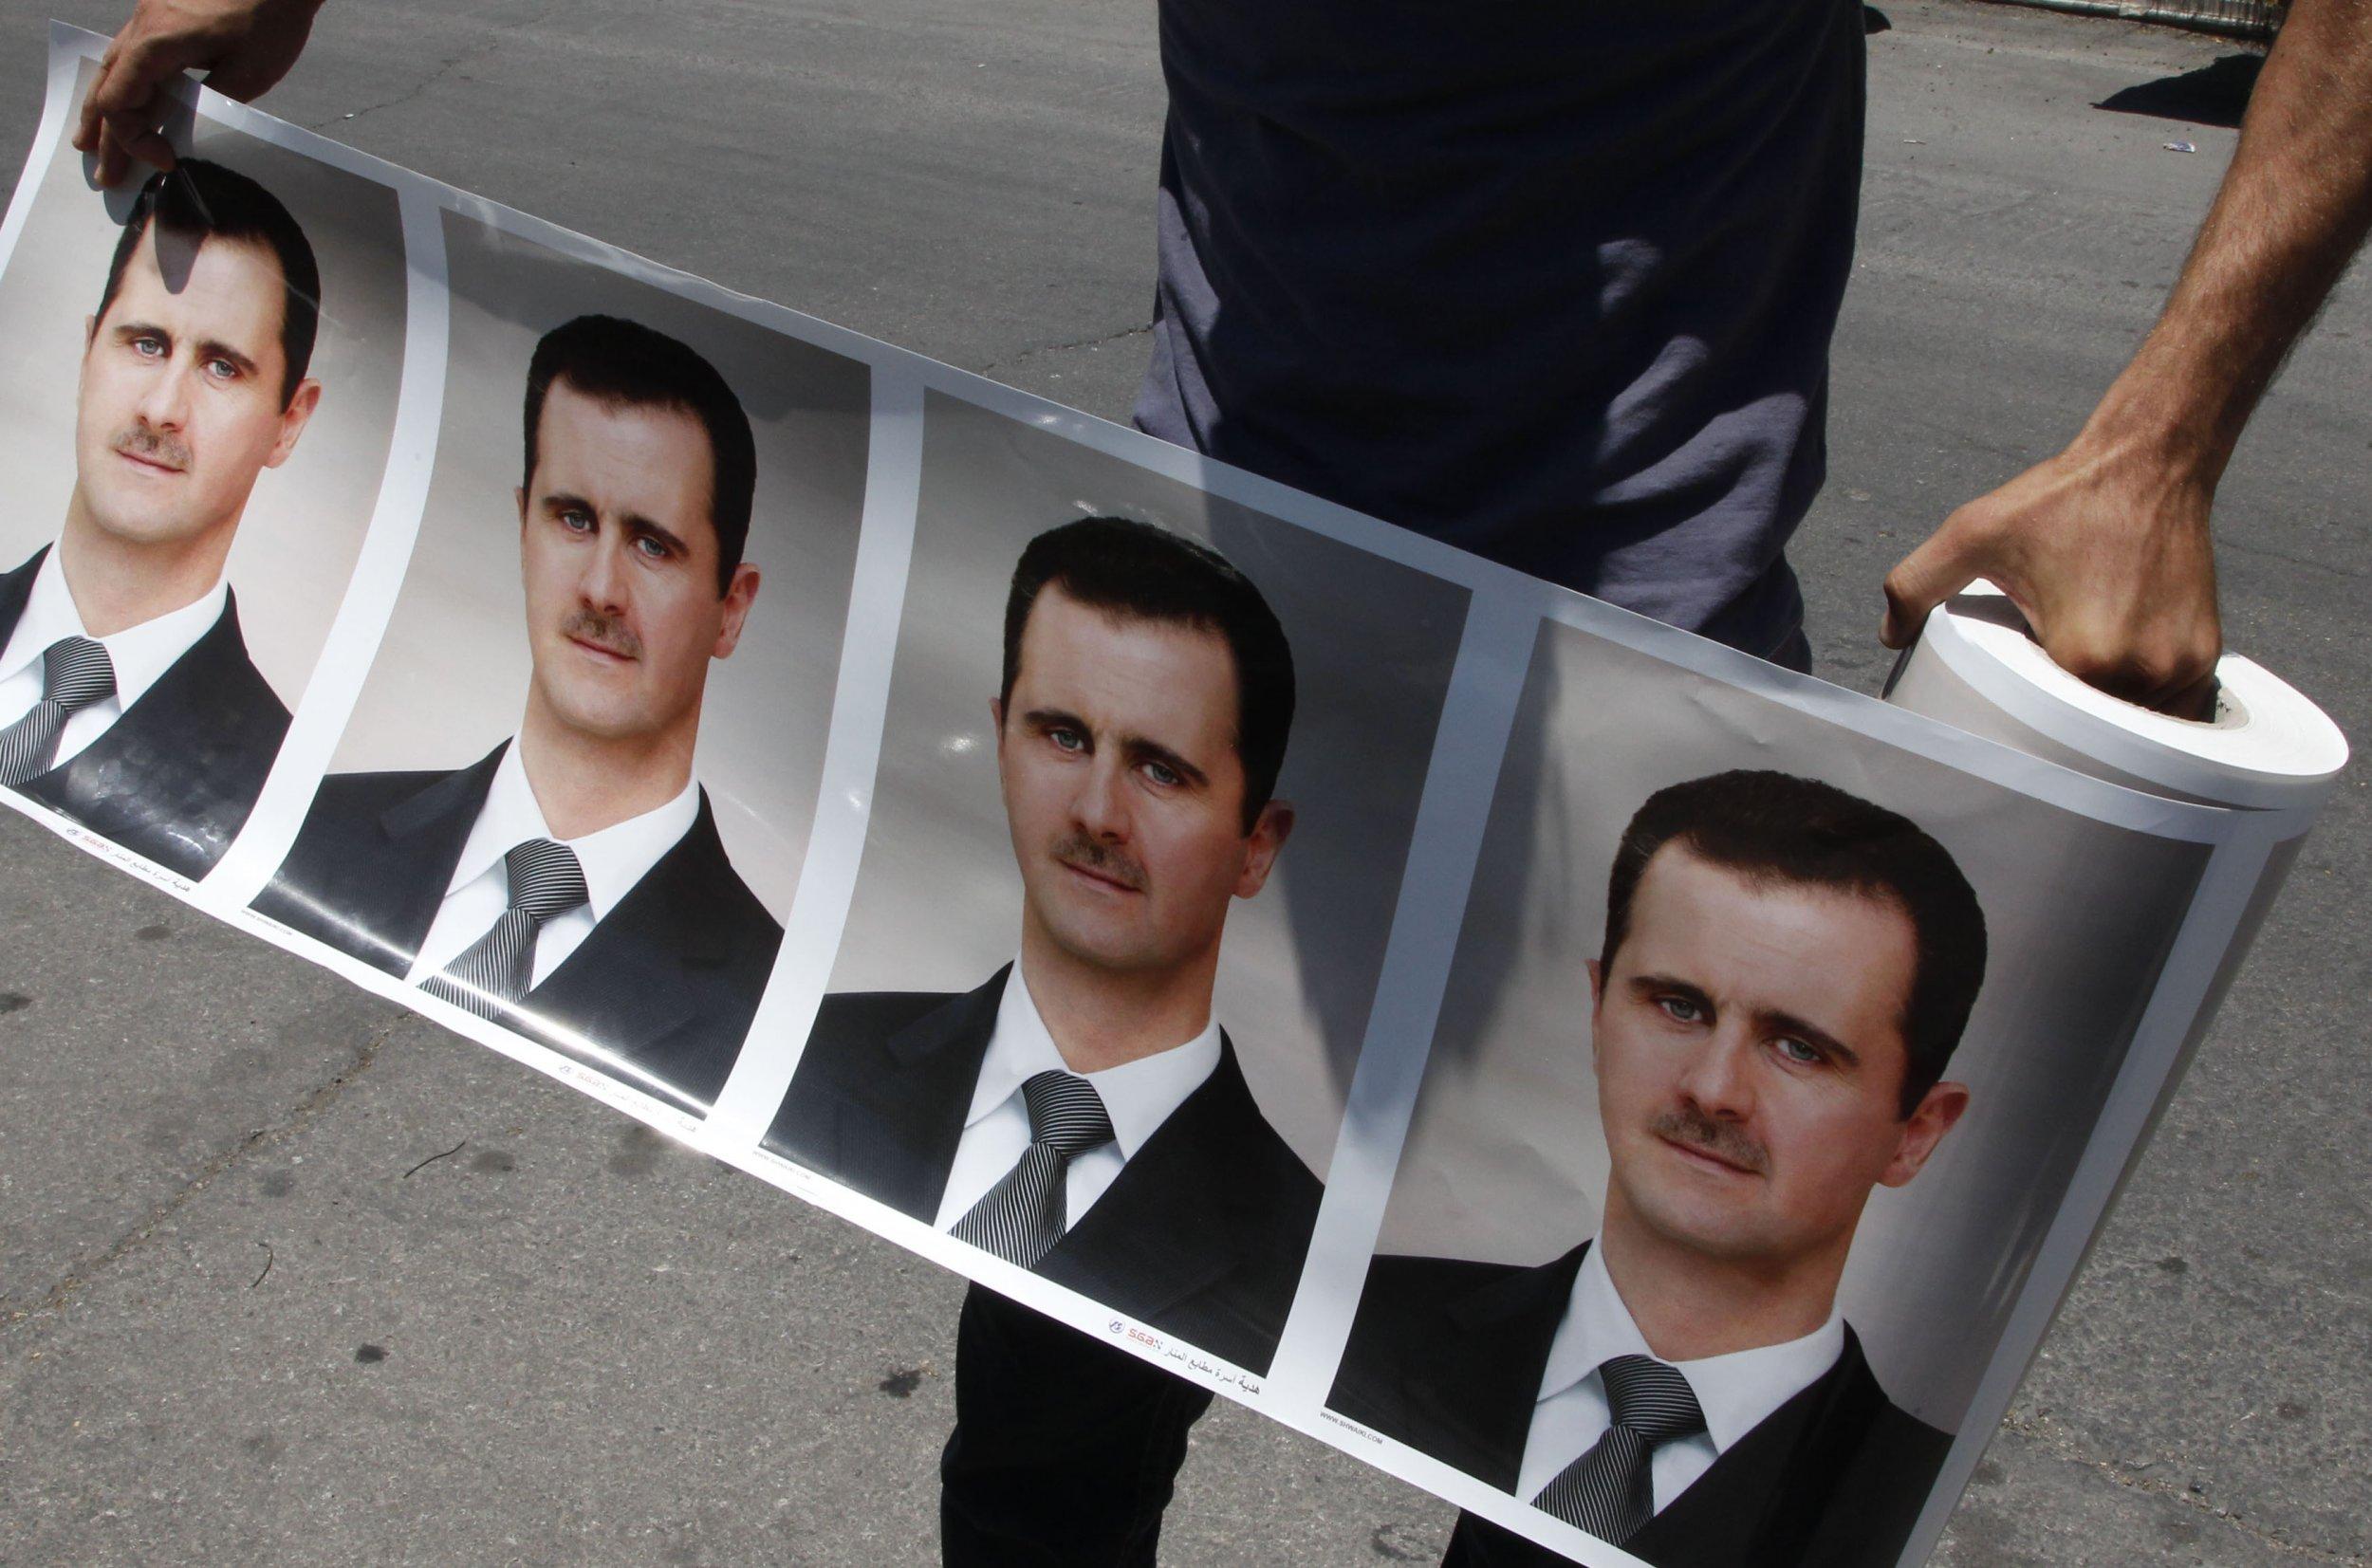 Assad photos